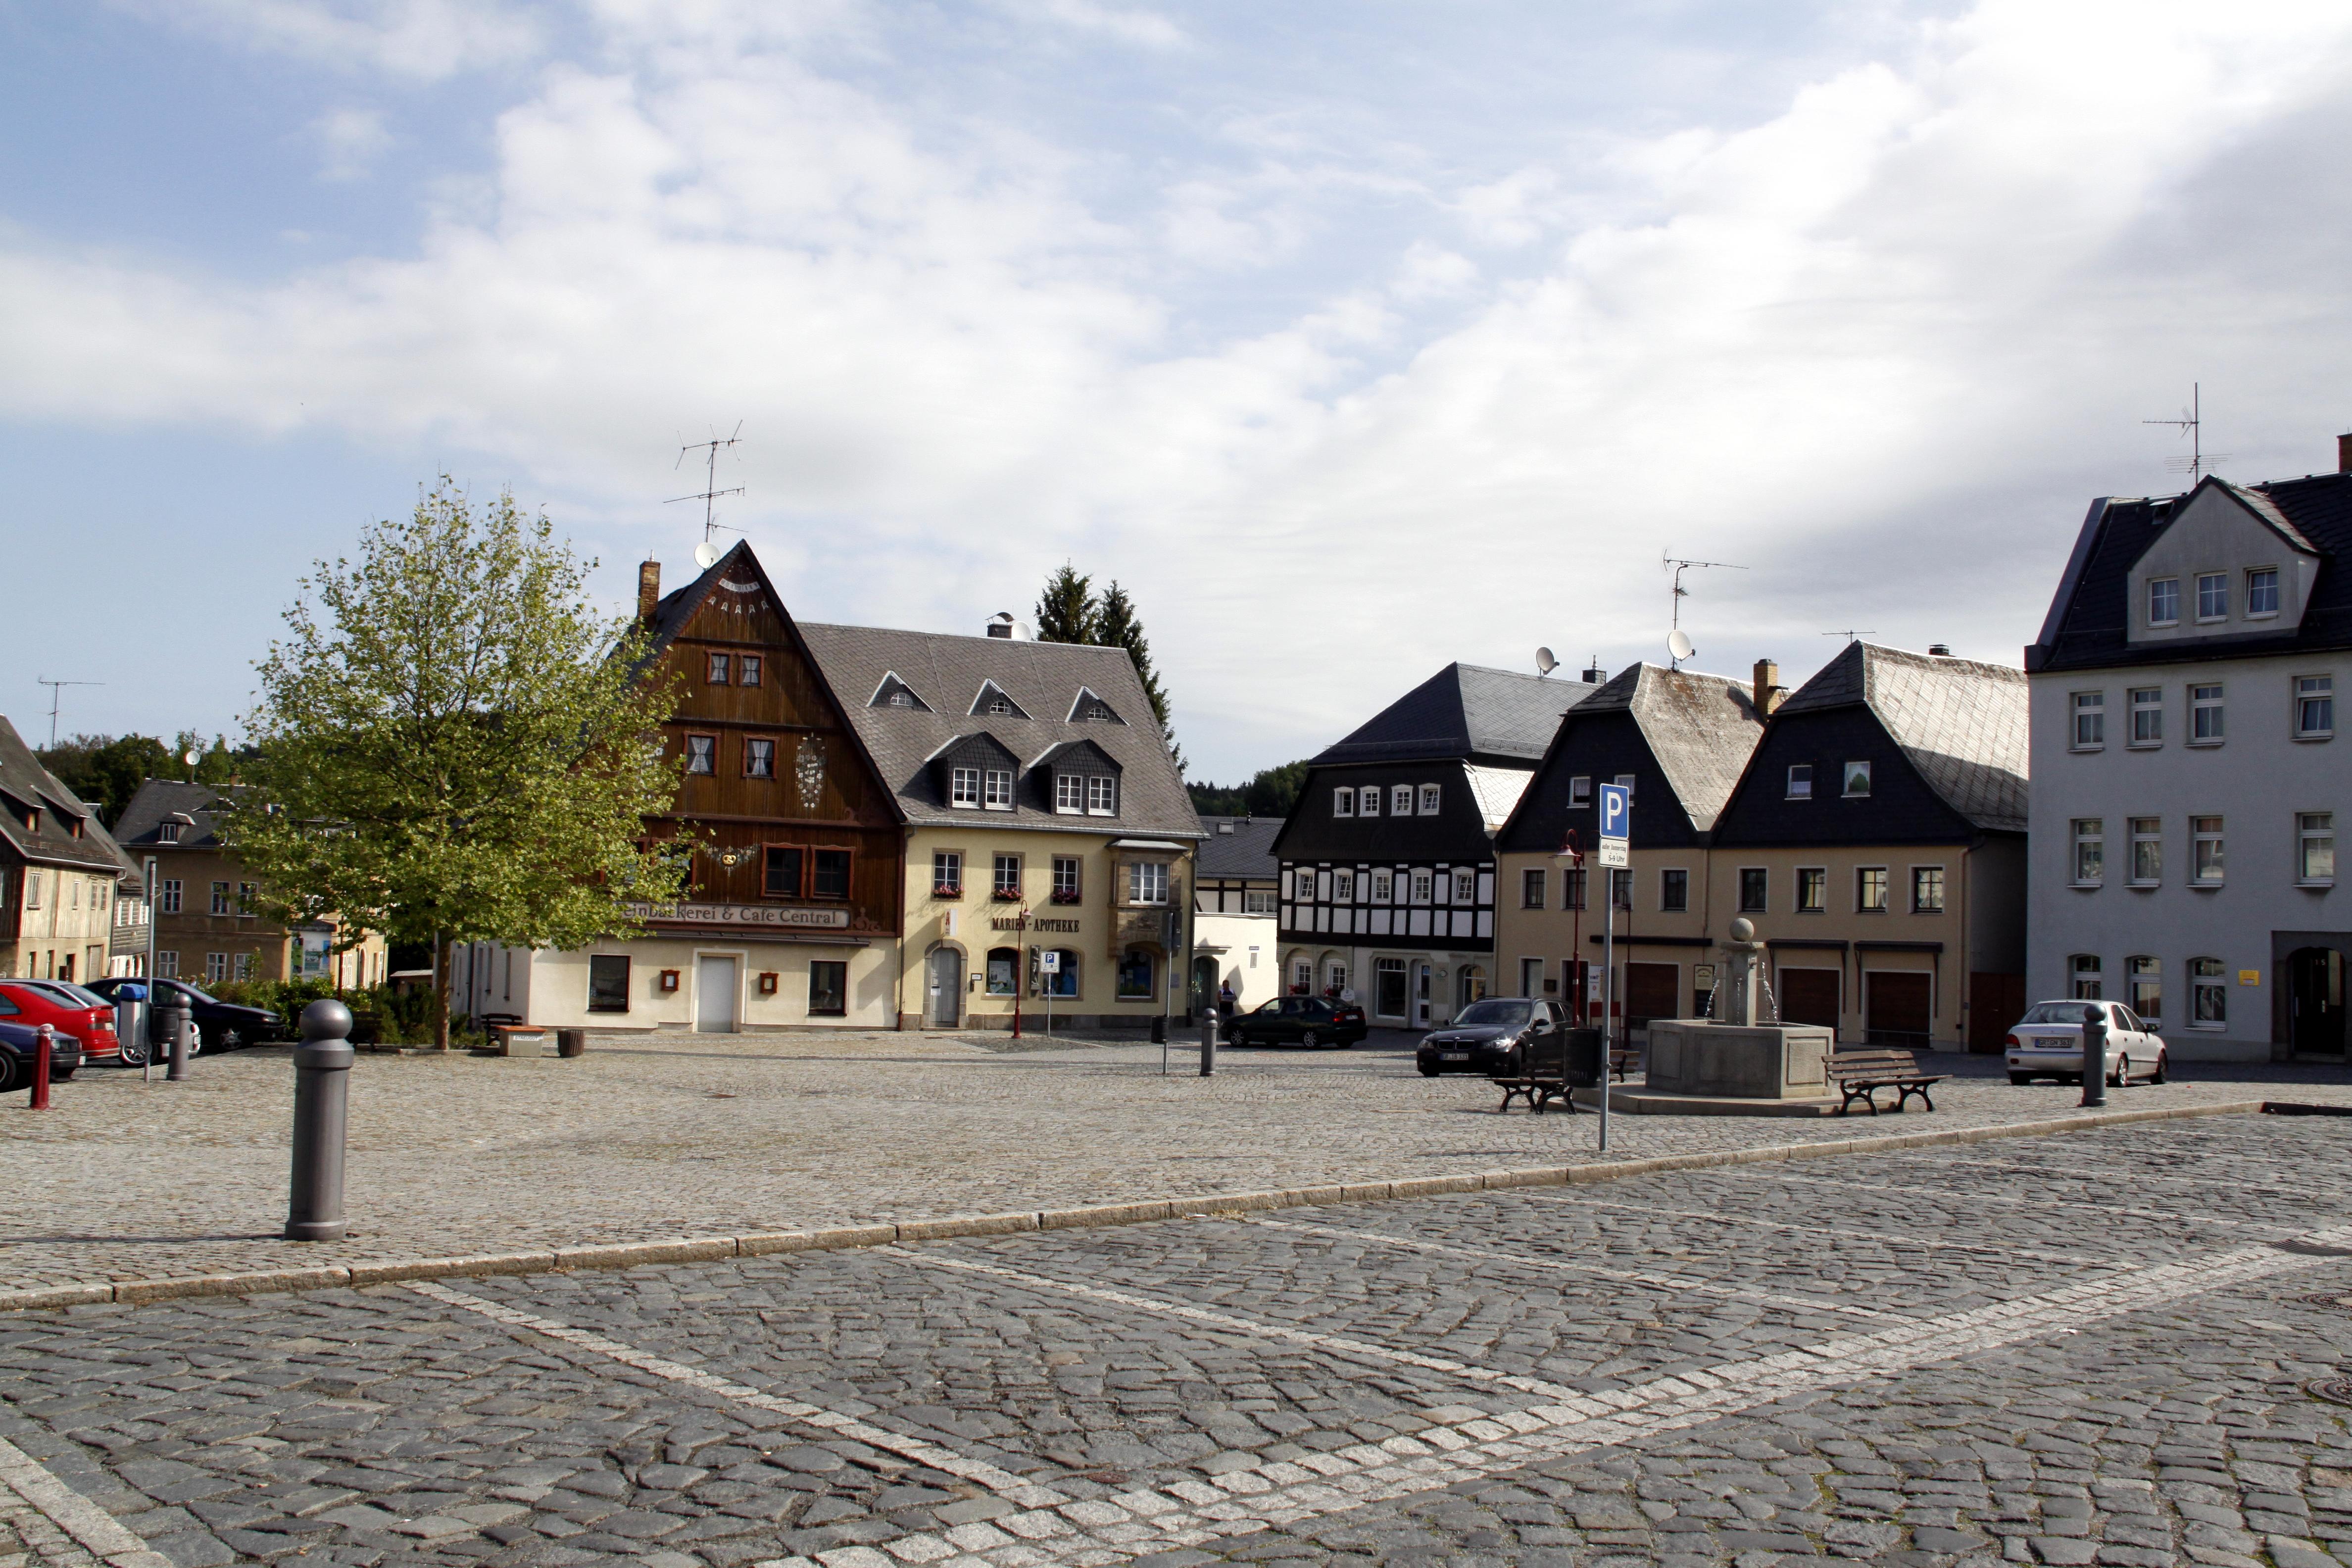 Neusalza Spremberg